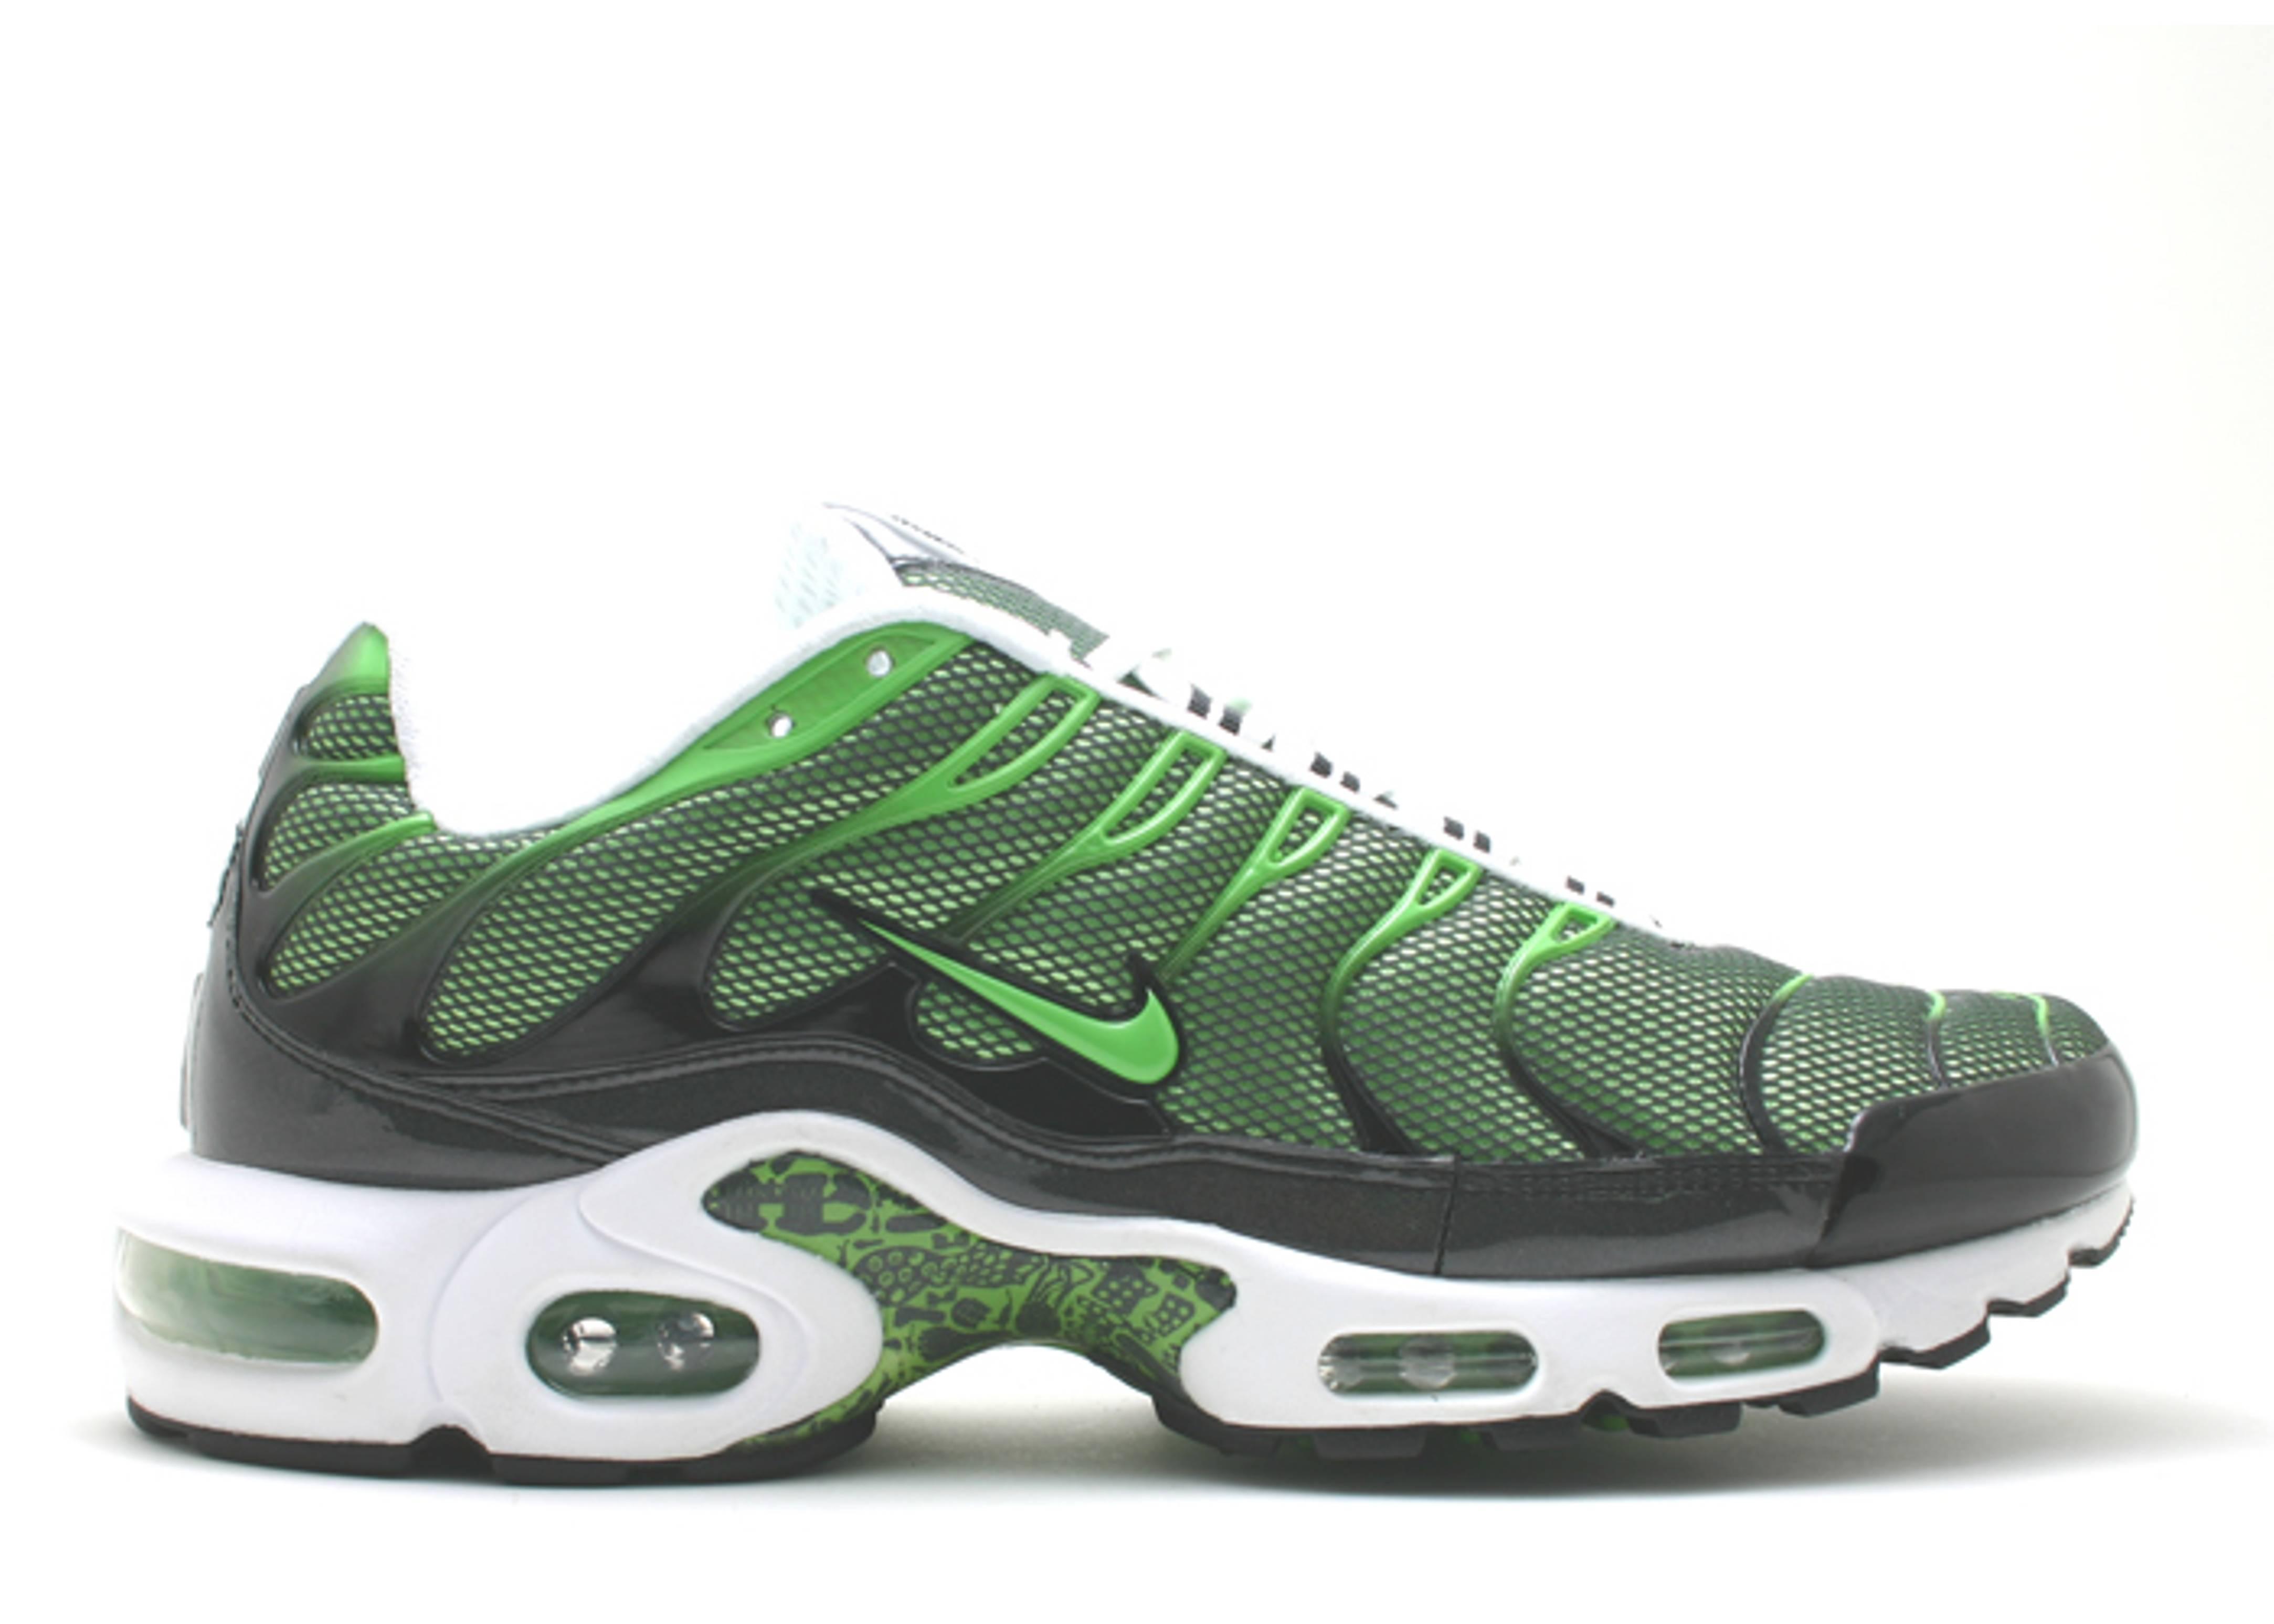 06f606490b6 Air Max Plus Rejuvenation - Nike - 313670 031 - black/green bean ...